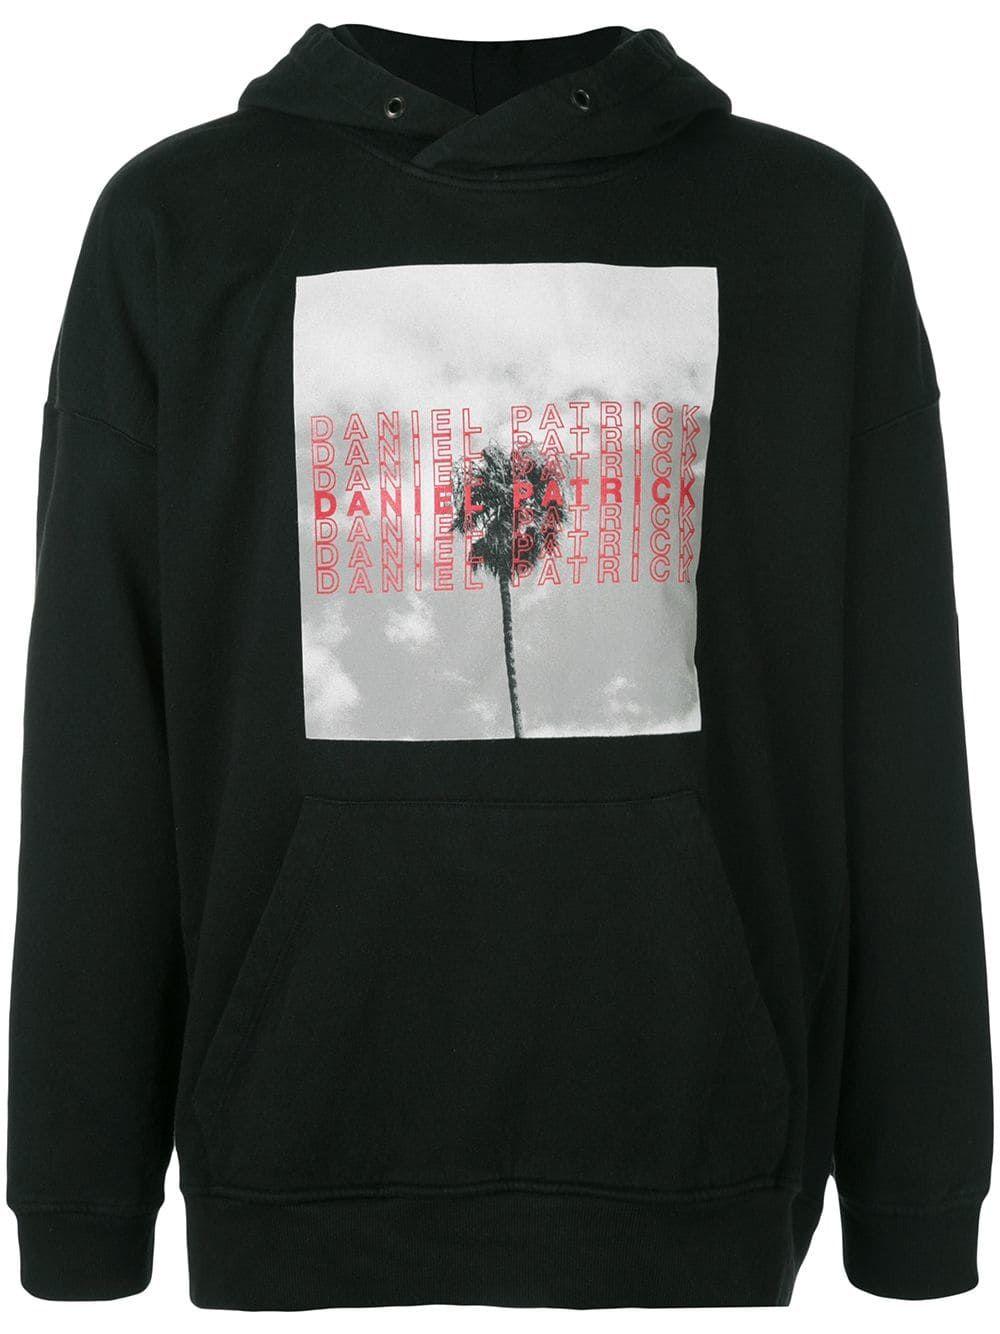 Daniel Patrick La Palm Hooded Sweatshirt In Black Modesens In 2020 Hooded Sweatshirts Black Sweatshirts Daniel Patrick [ 1334 x 1000 Pixel ]